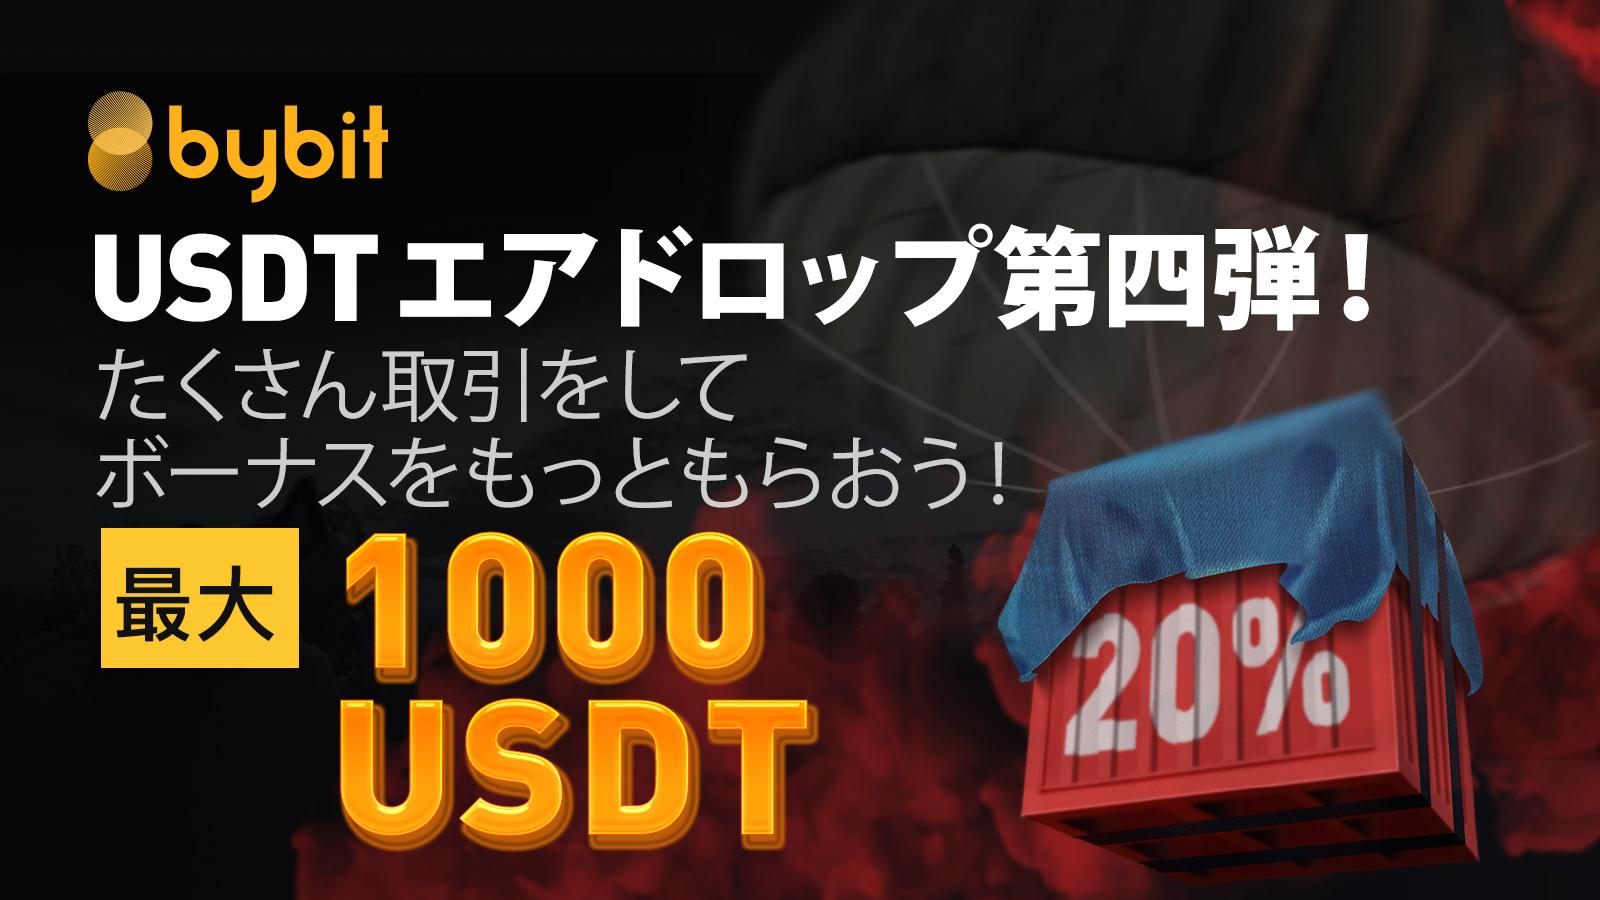 「Bybit」USDT エアドロップ|最大 1000 USDTボーナスが獲得可能!